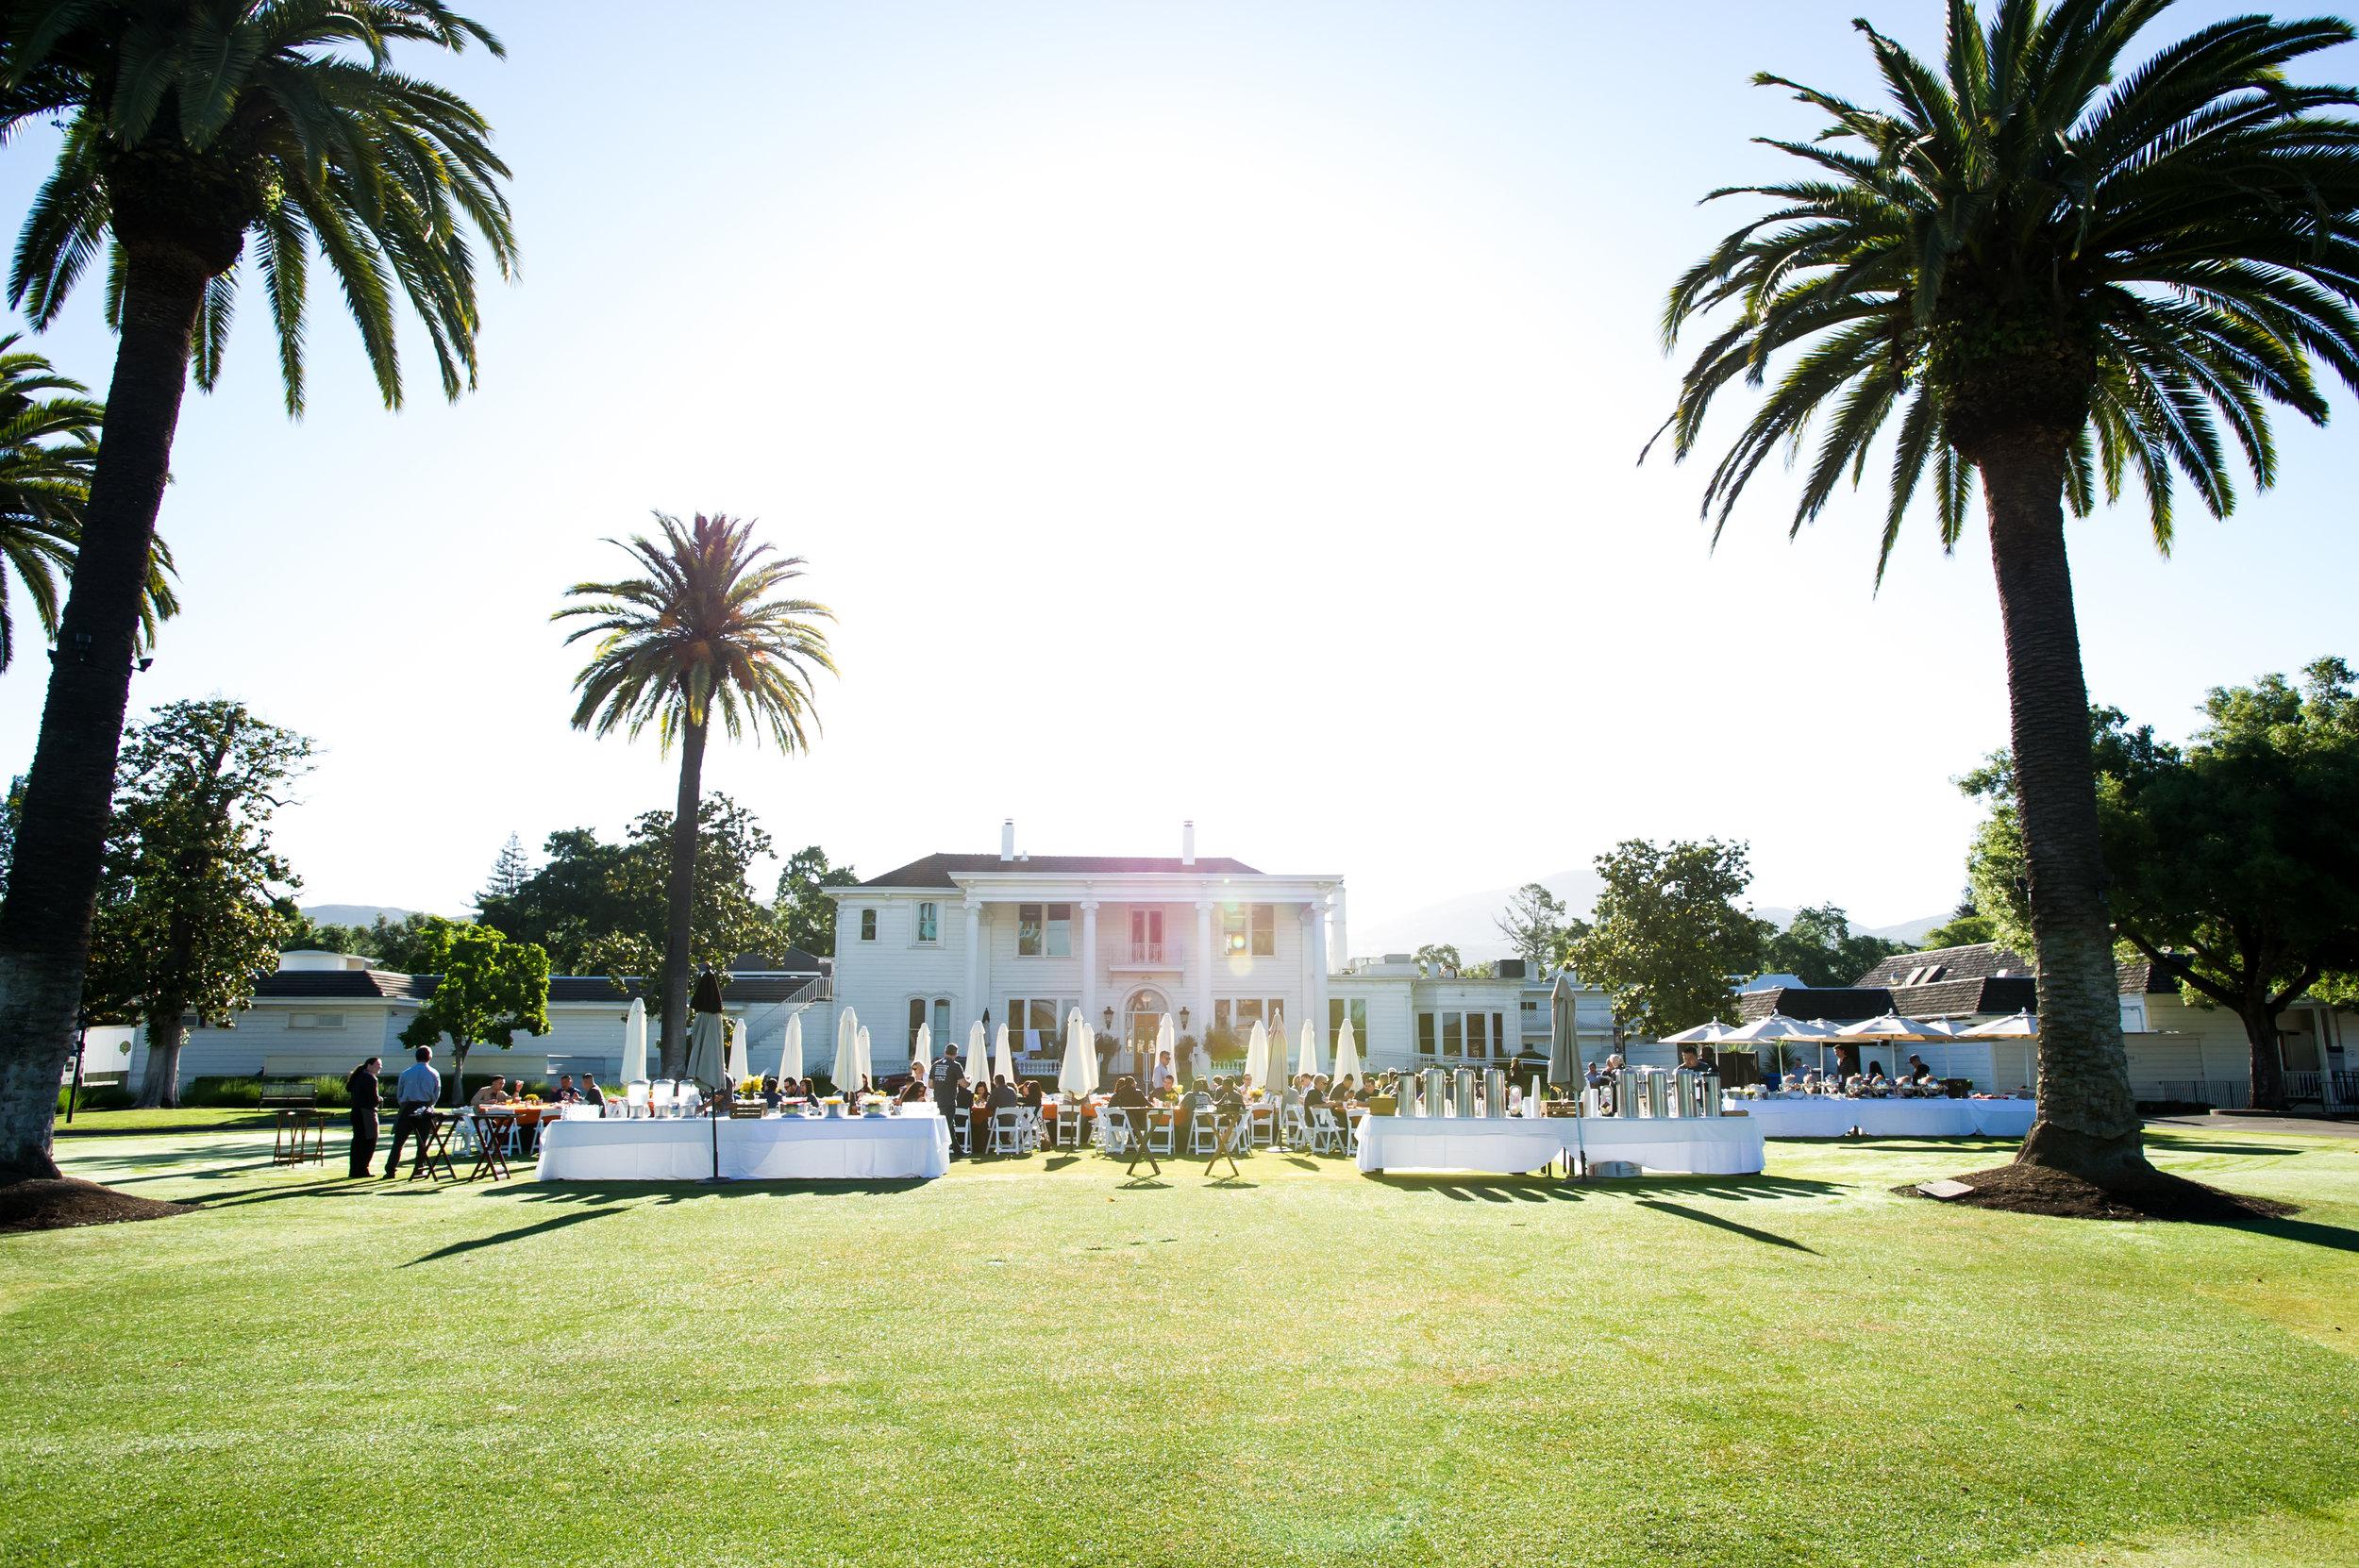 Chloe-Jackman-Photography-Silverado-resort-Event-2017-1339.jpg